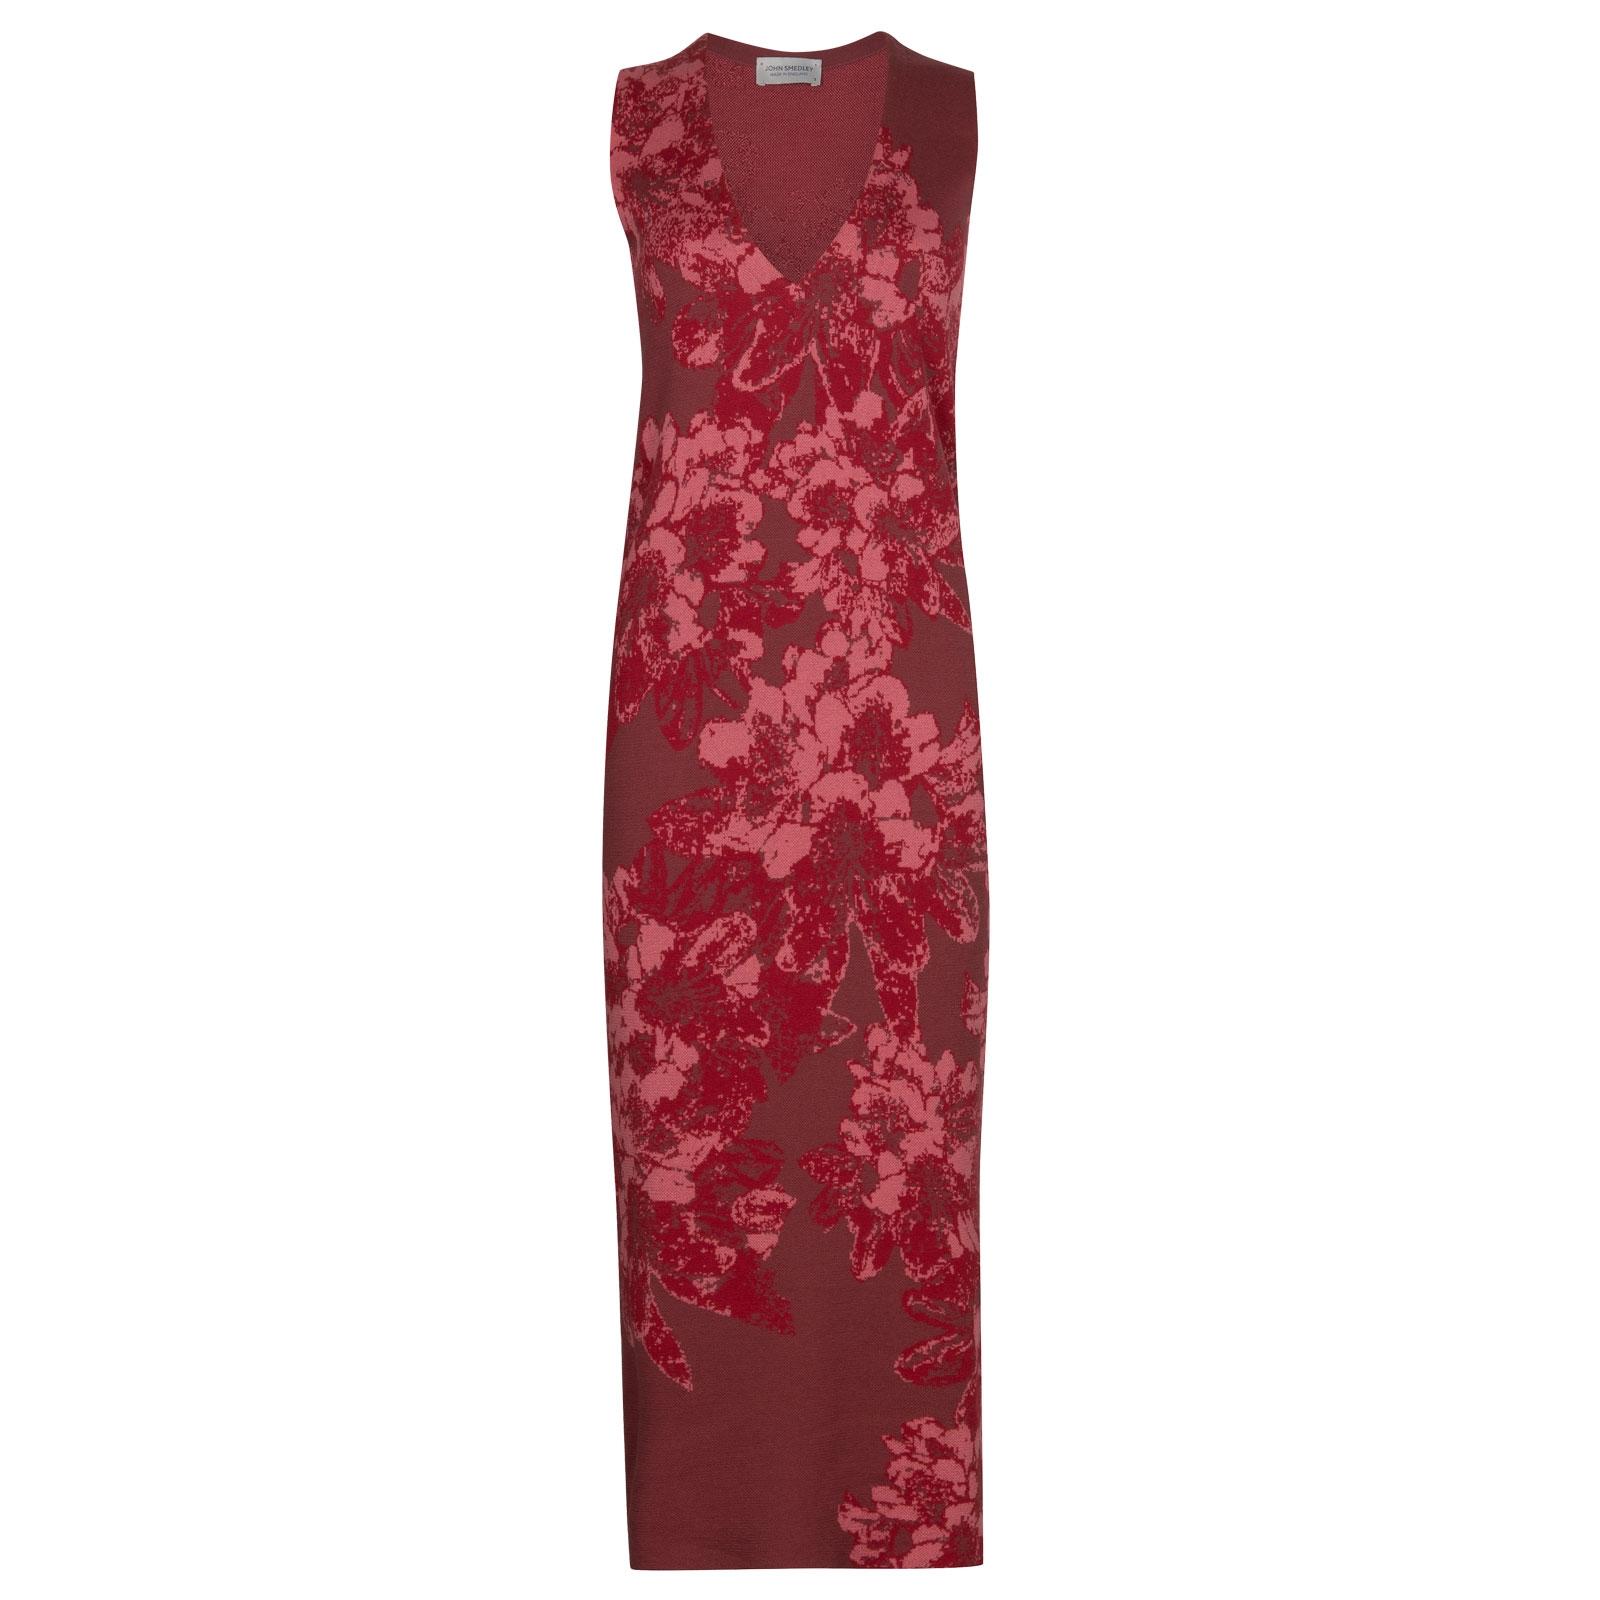 John Smedley Dempsey in Botanical Blush Dress-SML